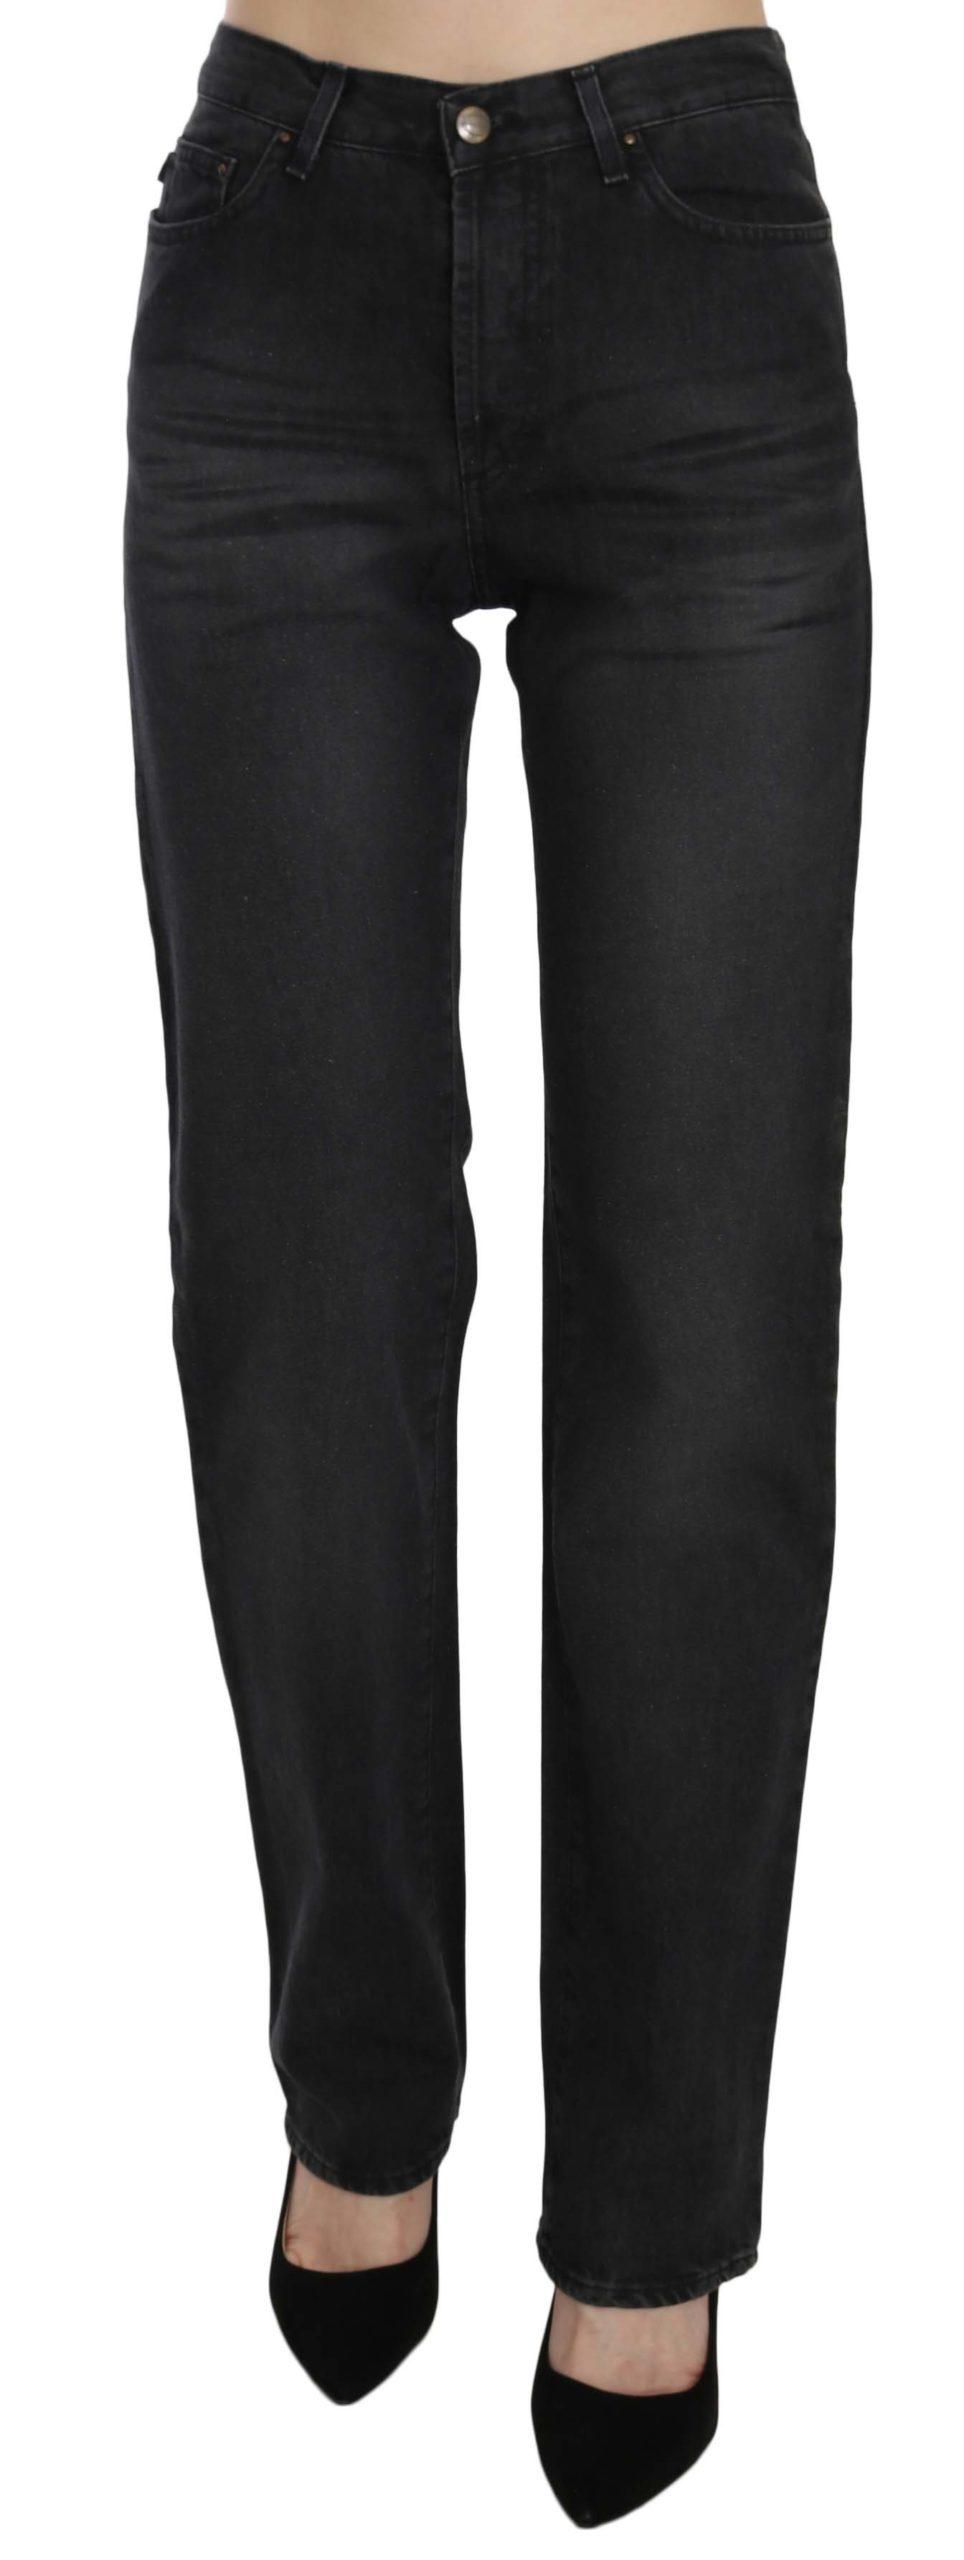 Just Cavalli Women's High Waist Straight Denim Trouser Black PAN70334 - W30